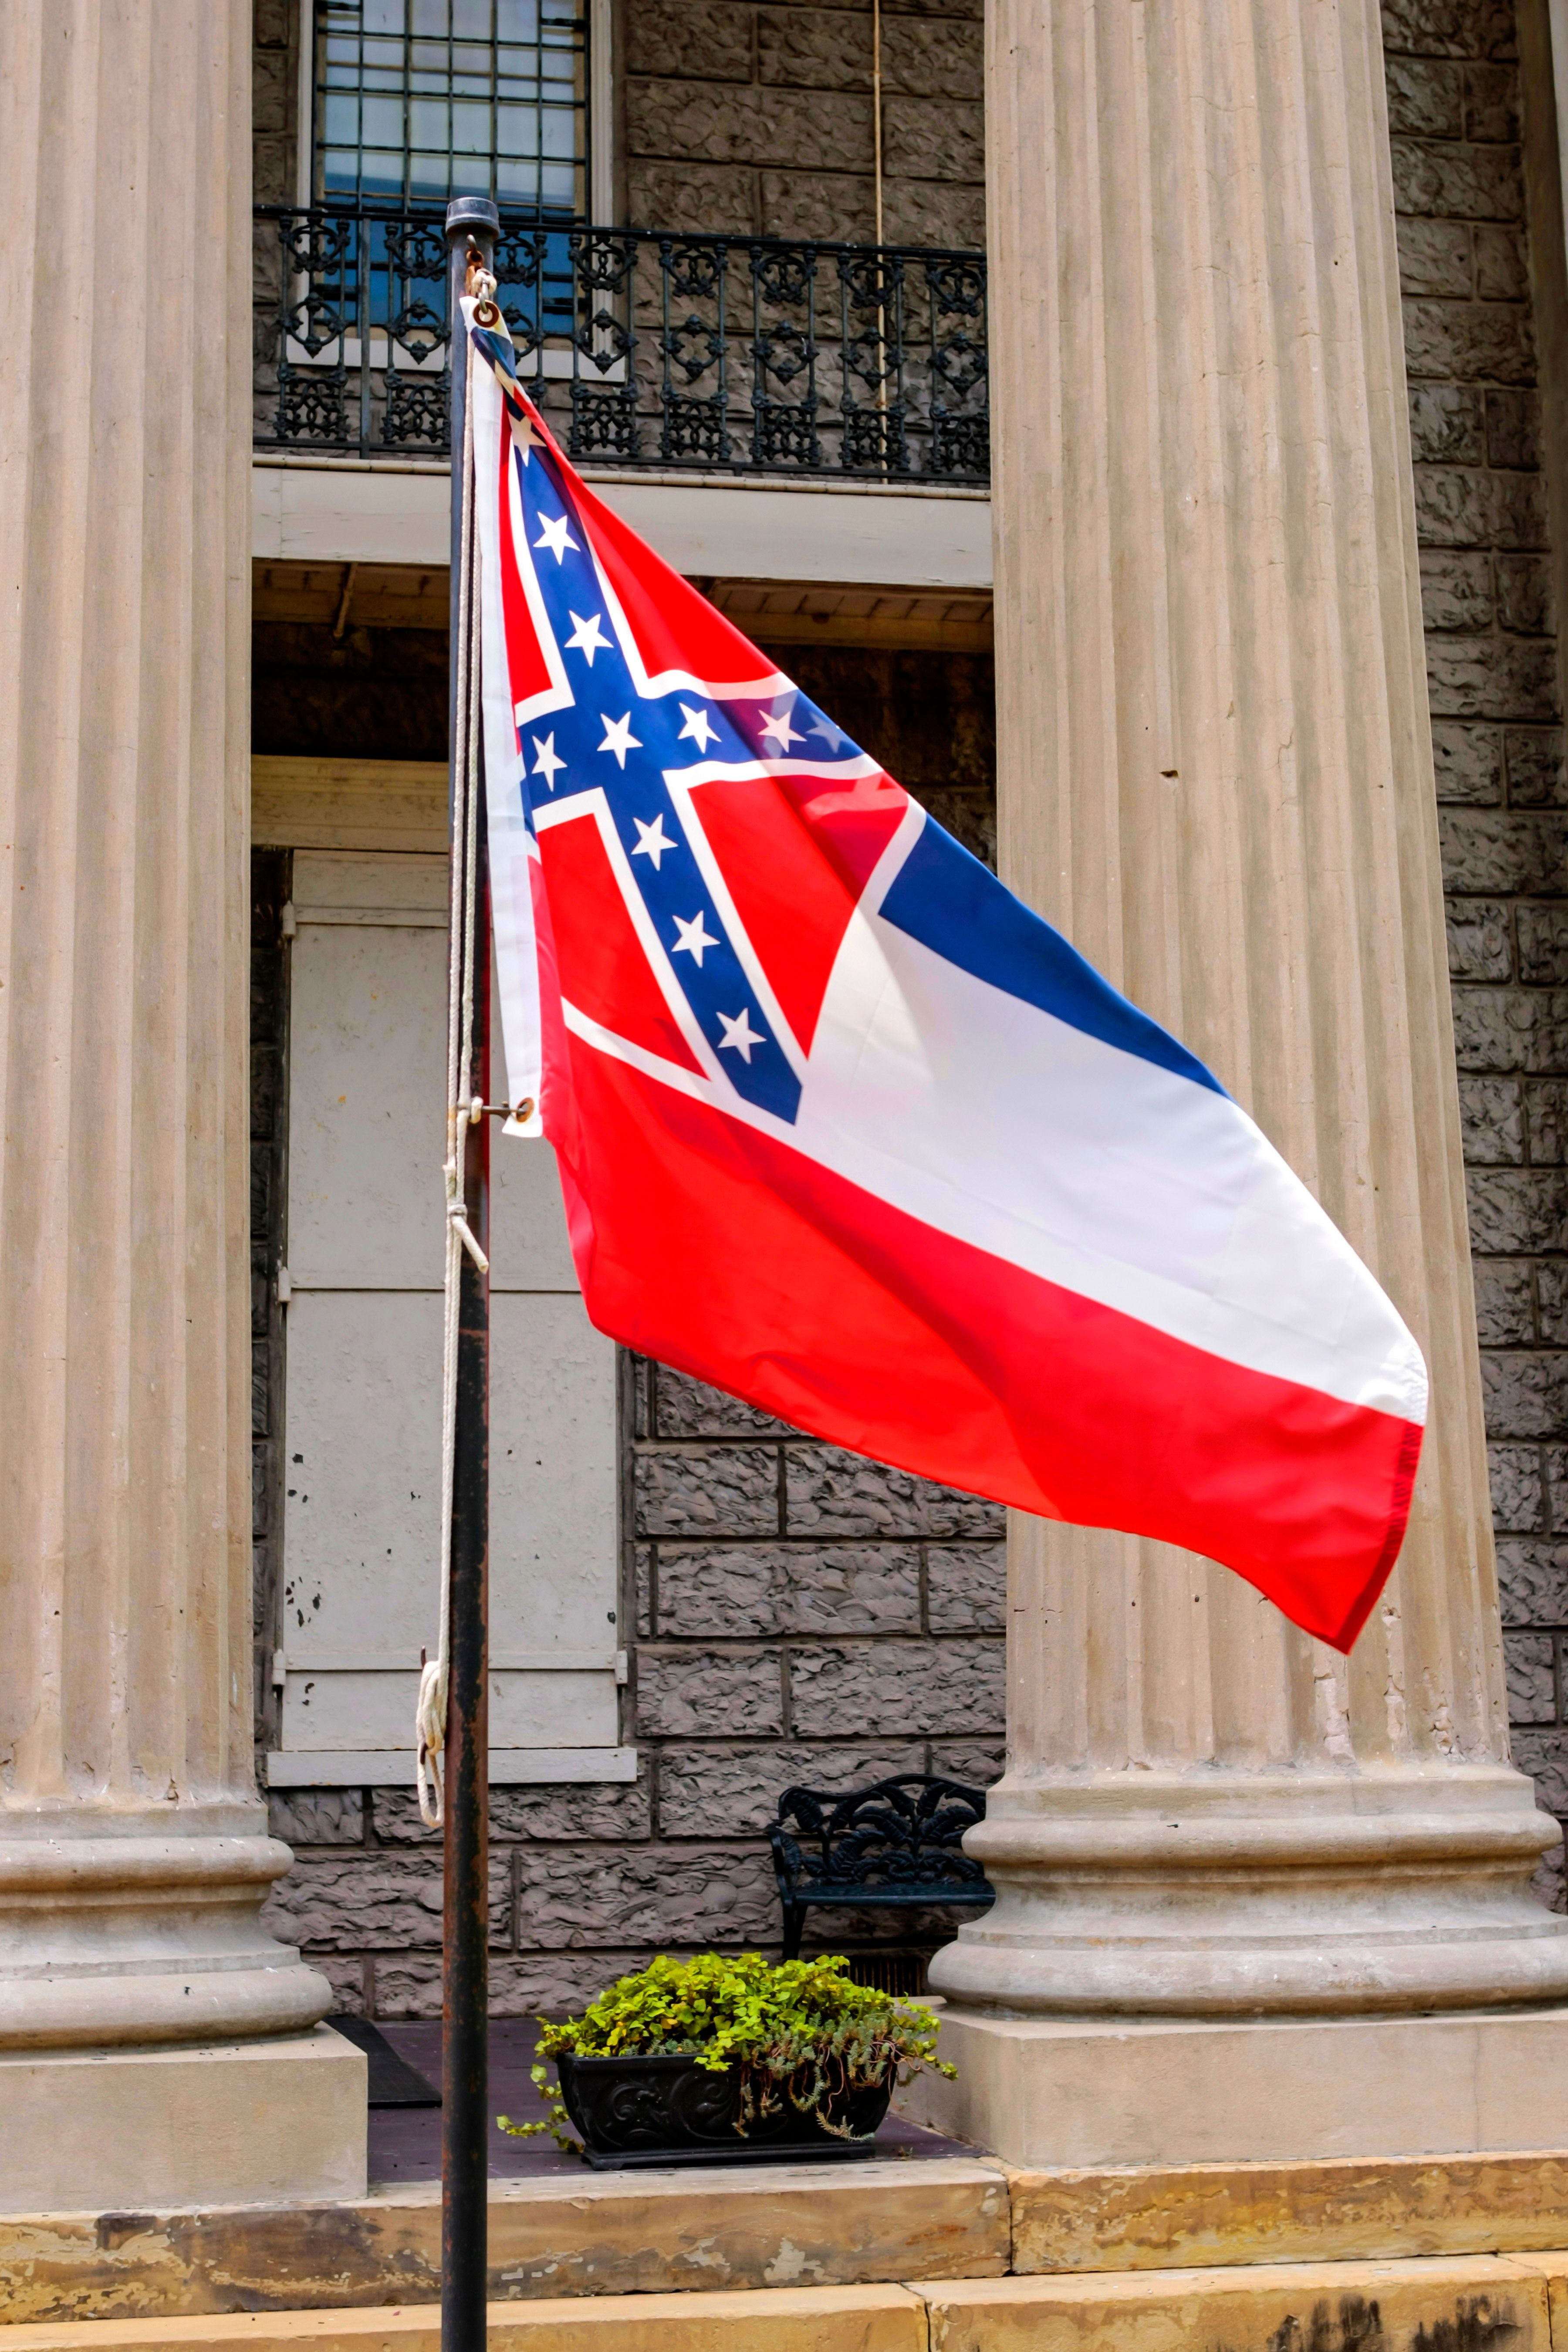 Vicksburg, MS, USA - June 8, 2015: The Mississippi State flag in Vicksburg MS